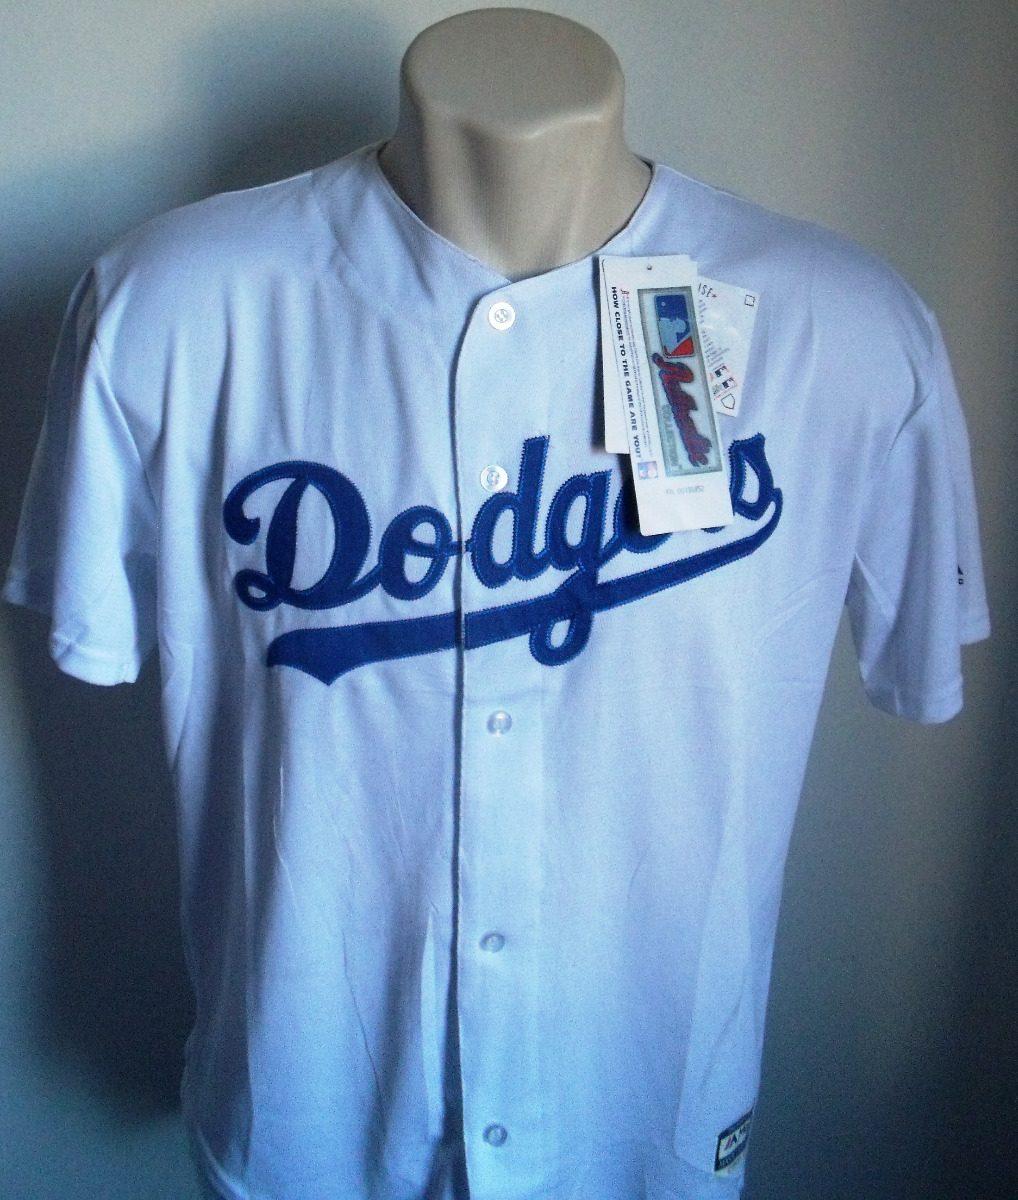 46a8408e9a905 camisa baseball mlb los angeles dodgers branca bordada. Carregando zoom.